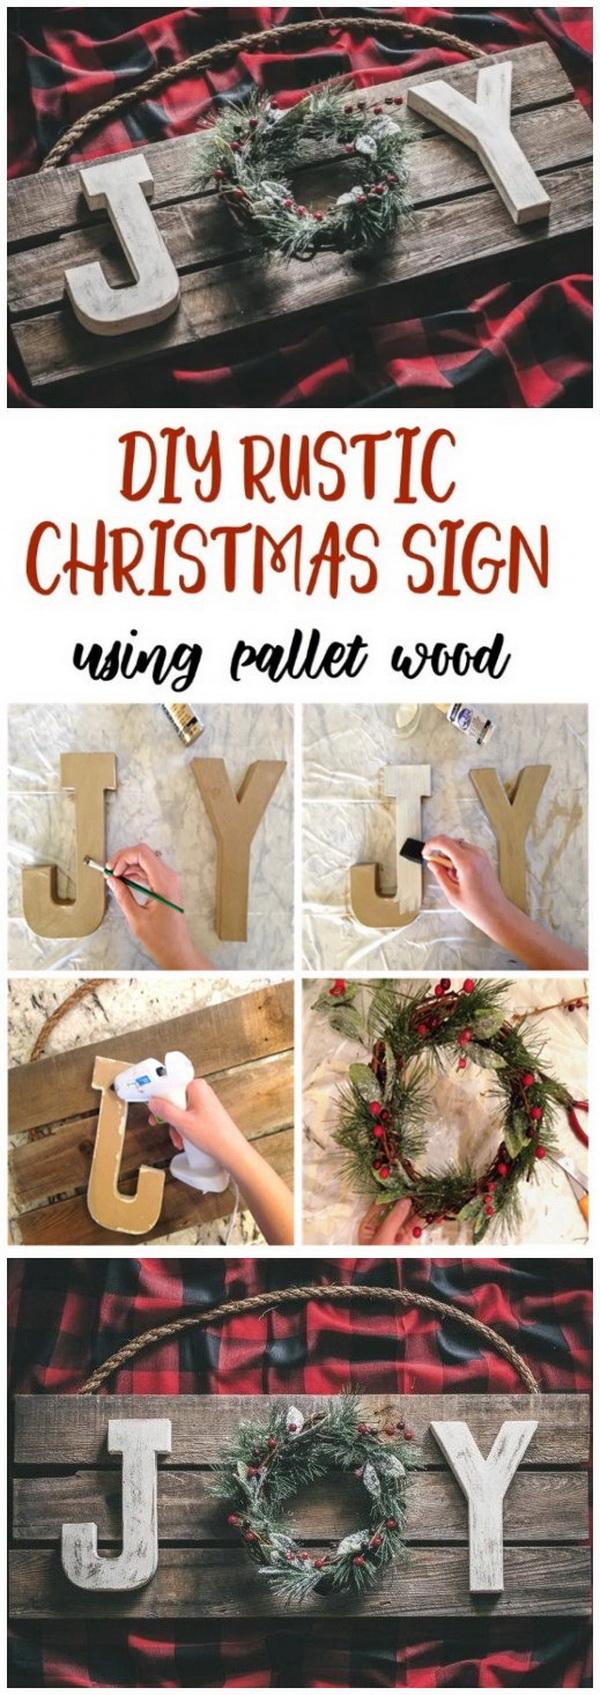 DIY Rustic Christmas Joy Sign Using Pallet Wood.